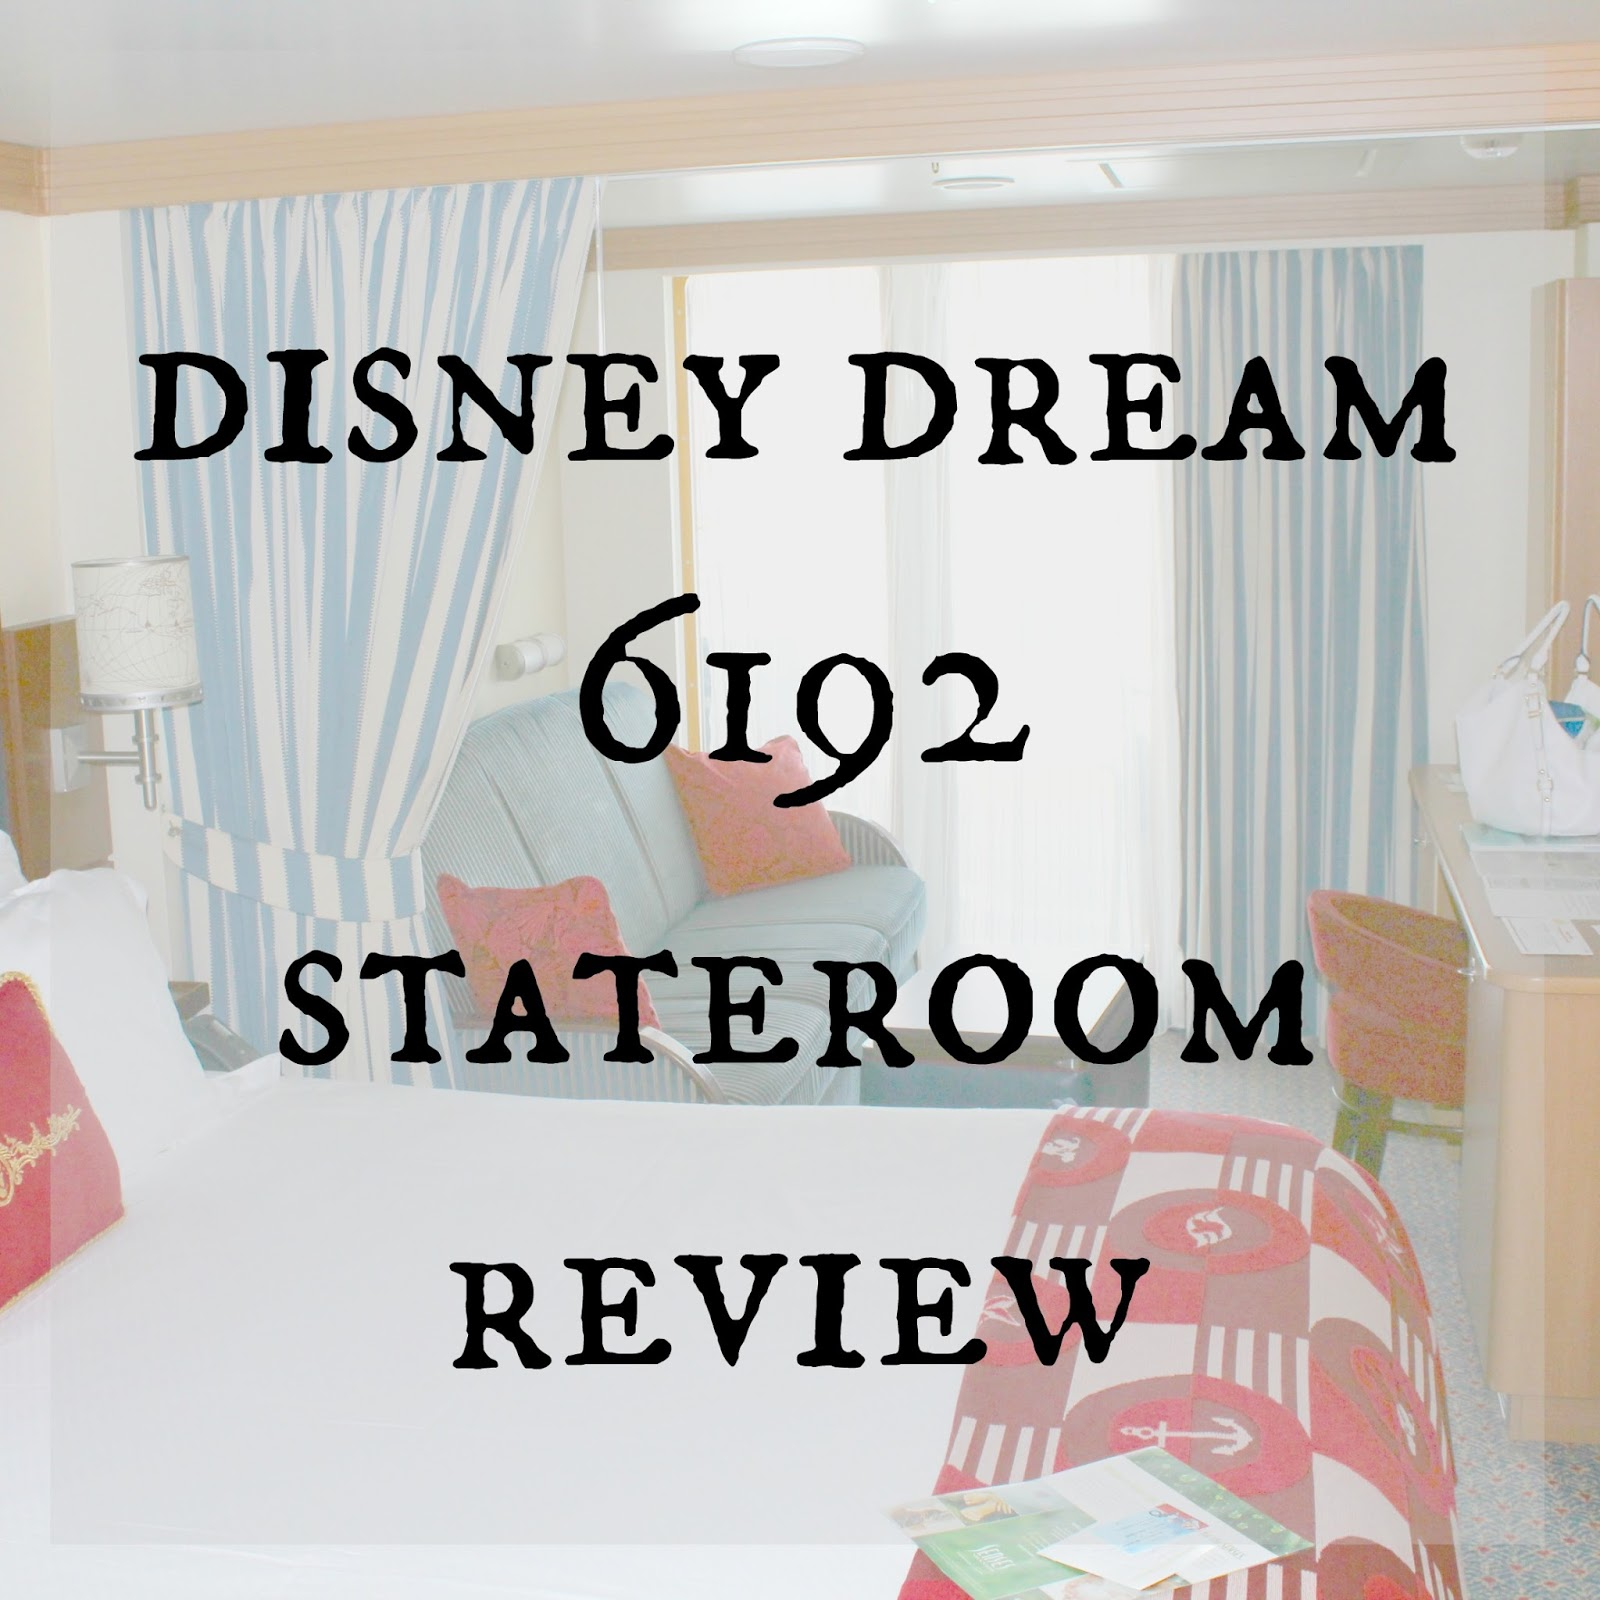 Caravan Sonnet Disney Dream 6192 Stateroom Review